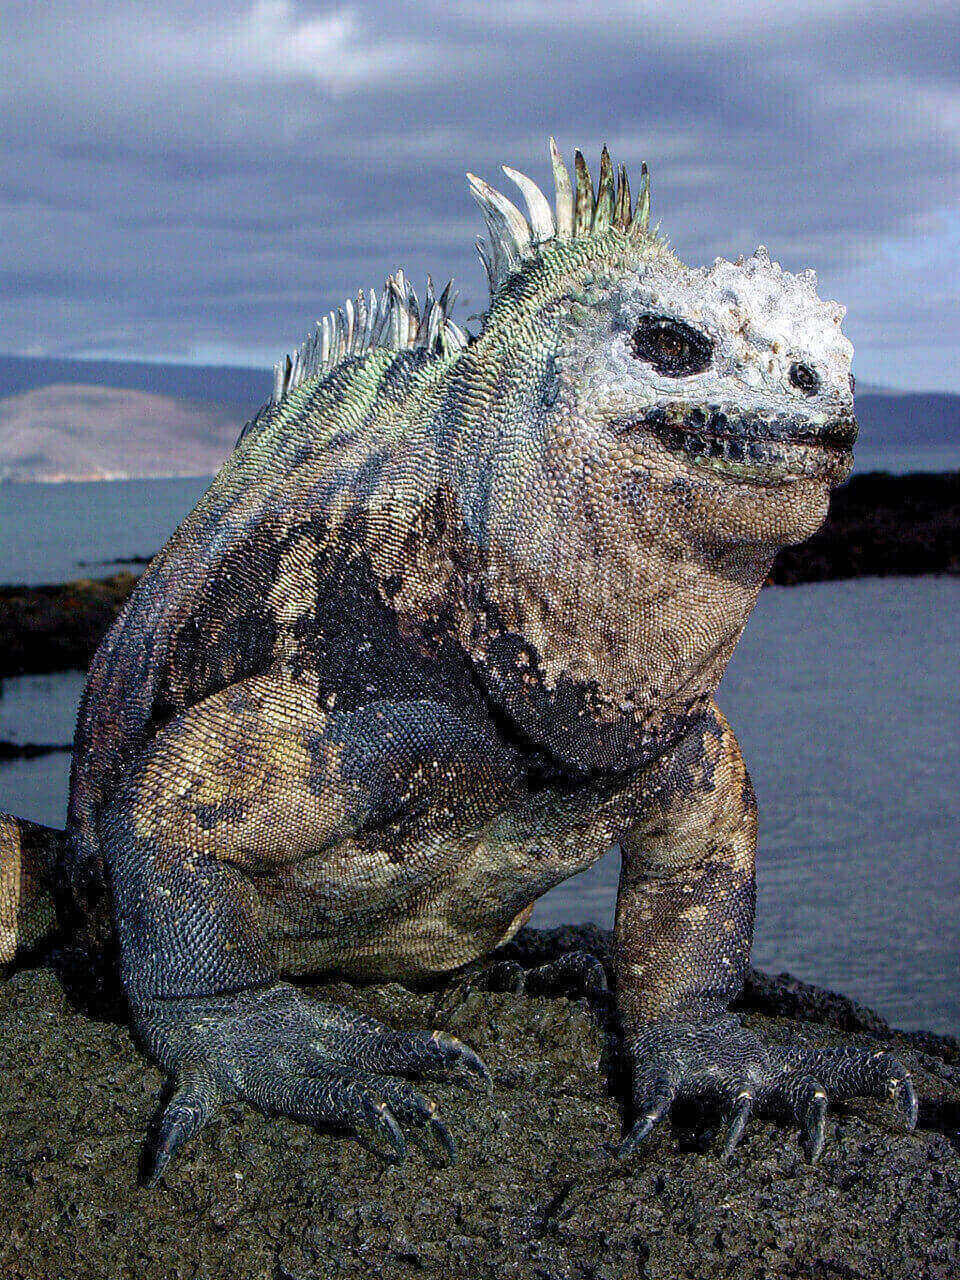 Marine iguana from the Galapagos islands